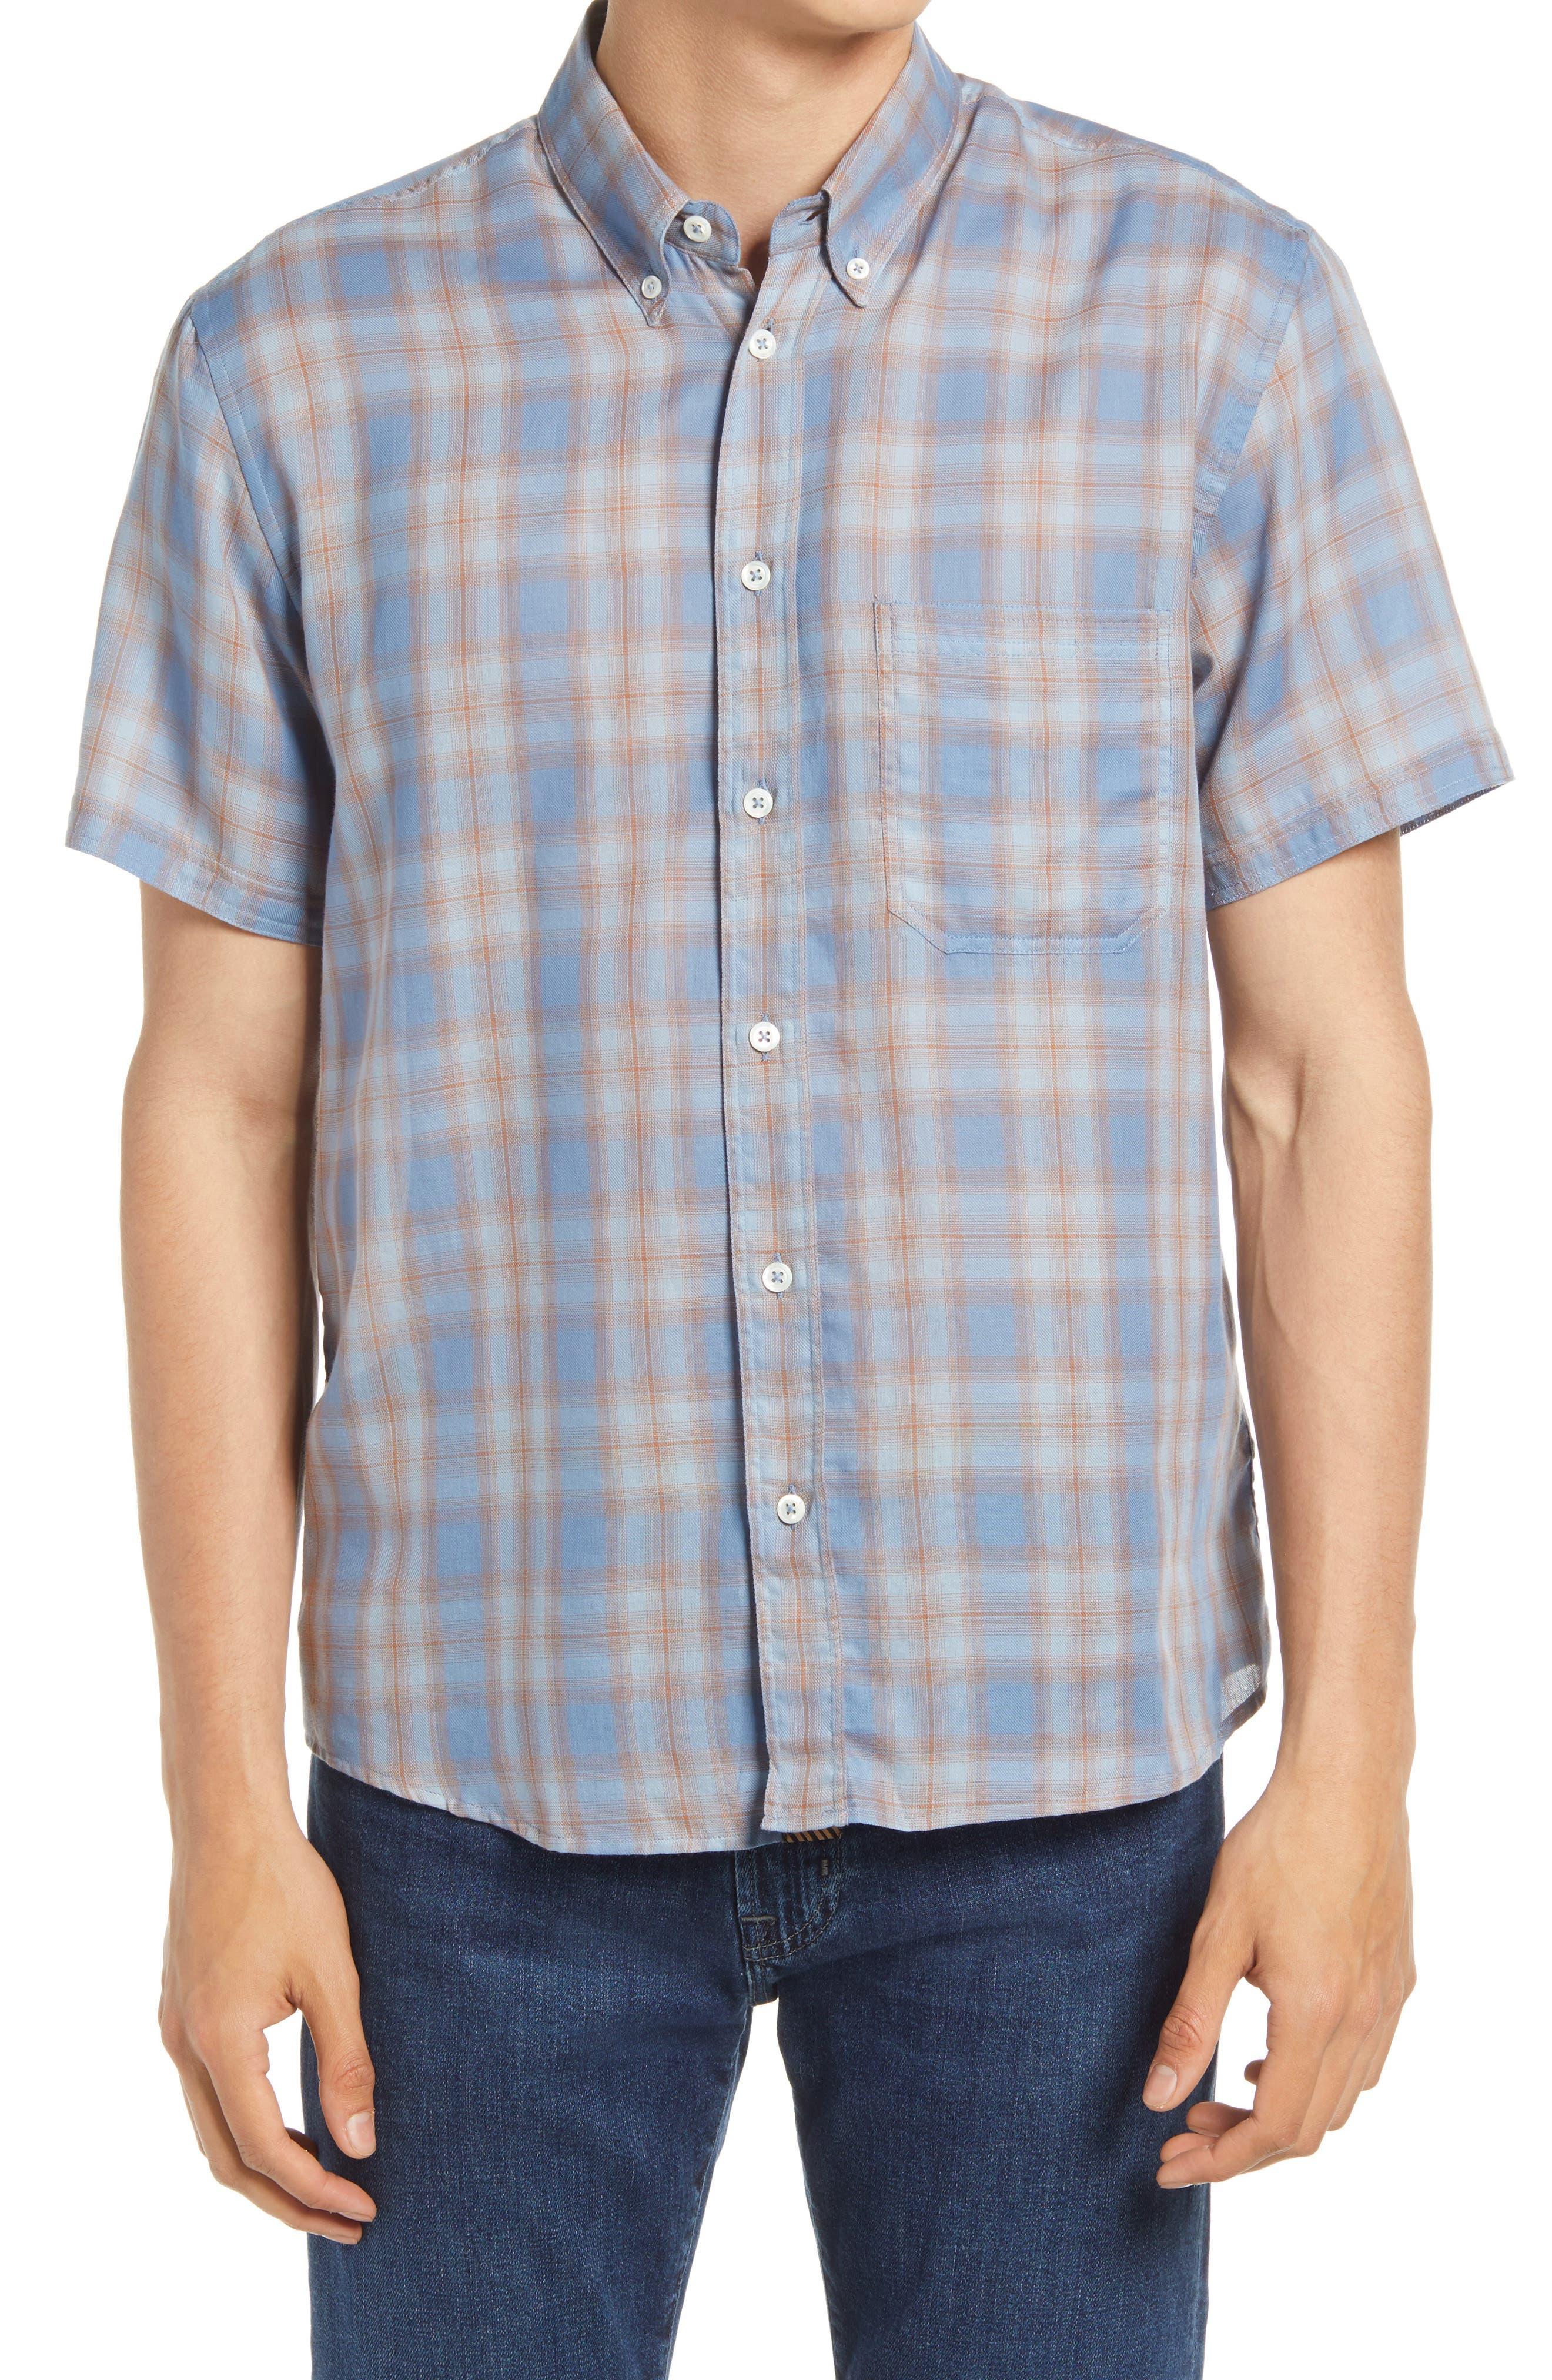 Tuscumbia Regular Fit Plaid Short Sleeve Button-Down Shirt